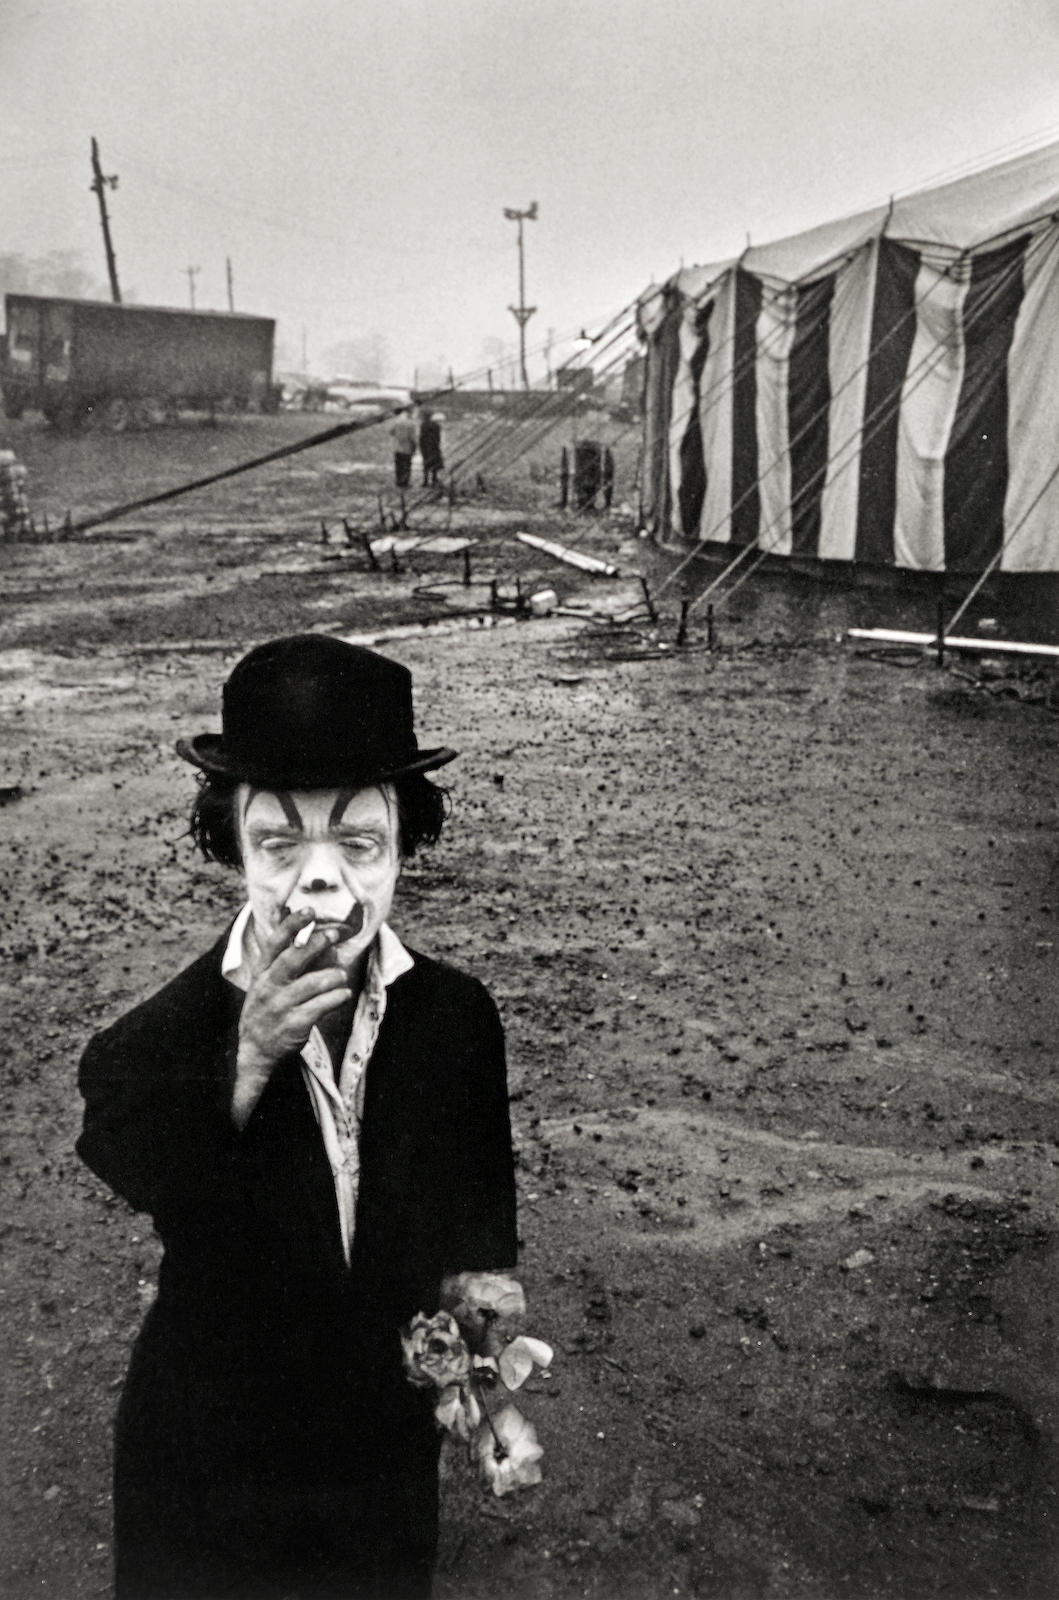 Bruce Davidson-Circus Dwarf, Palisades, New Jersey-1958